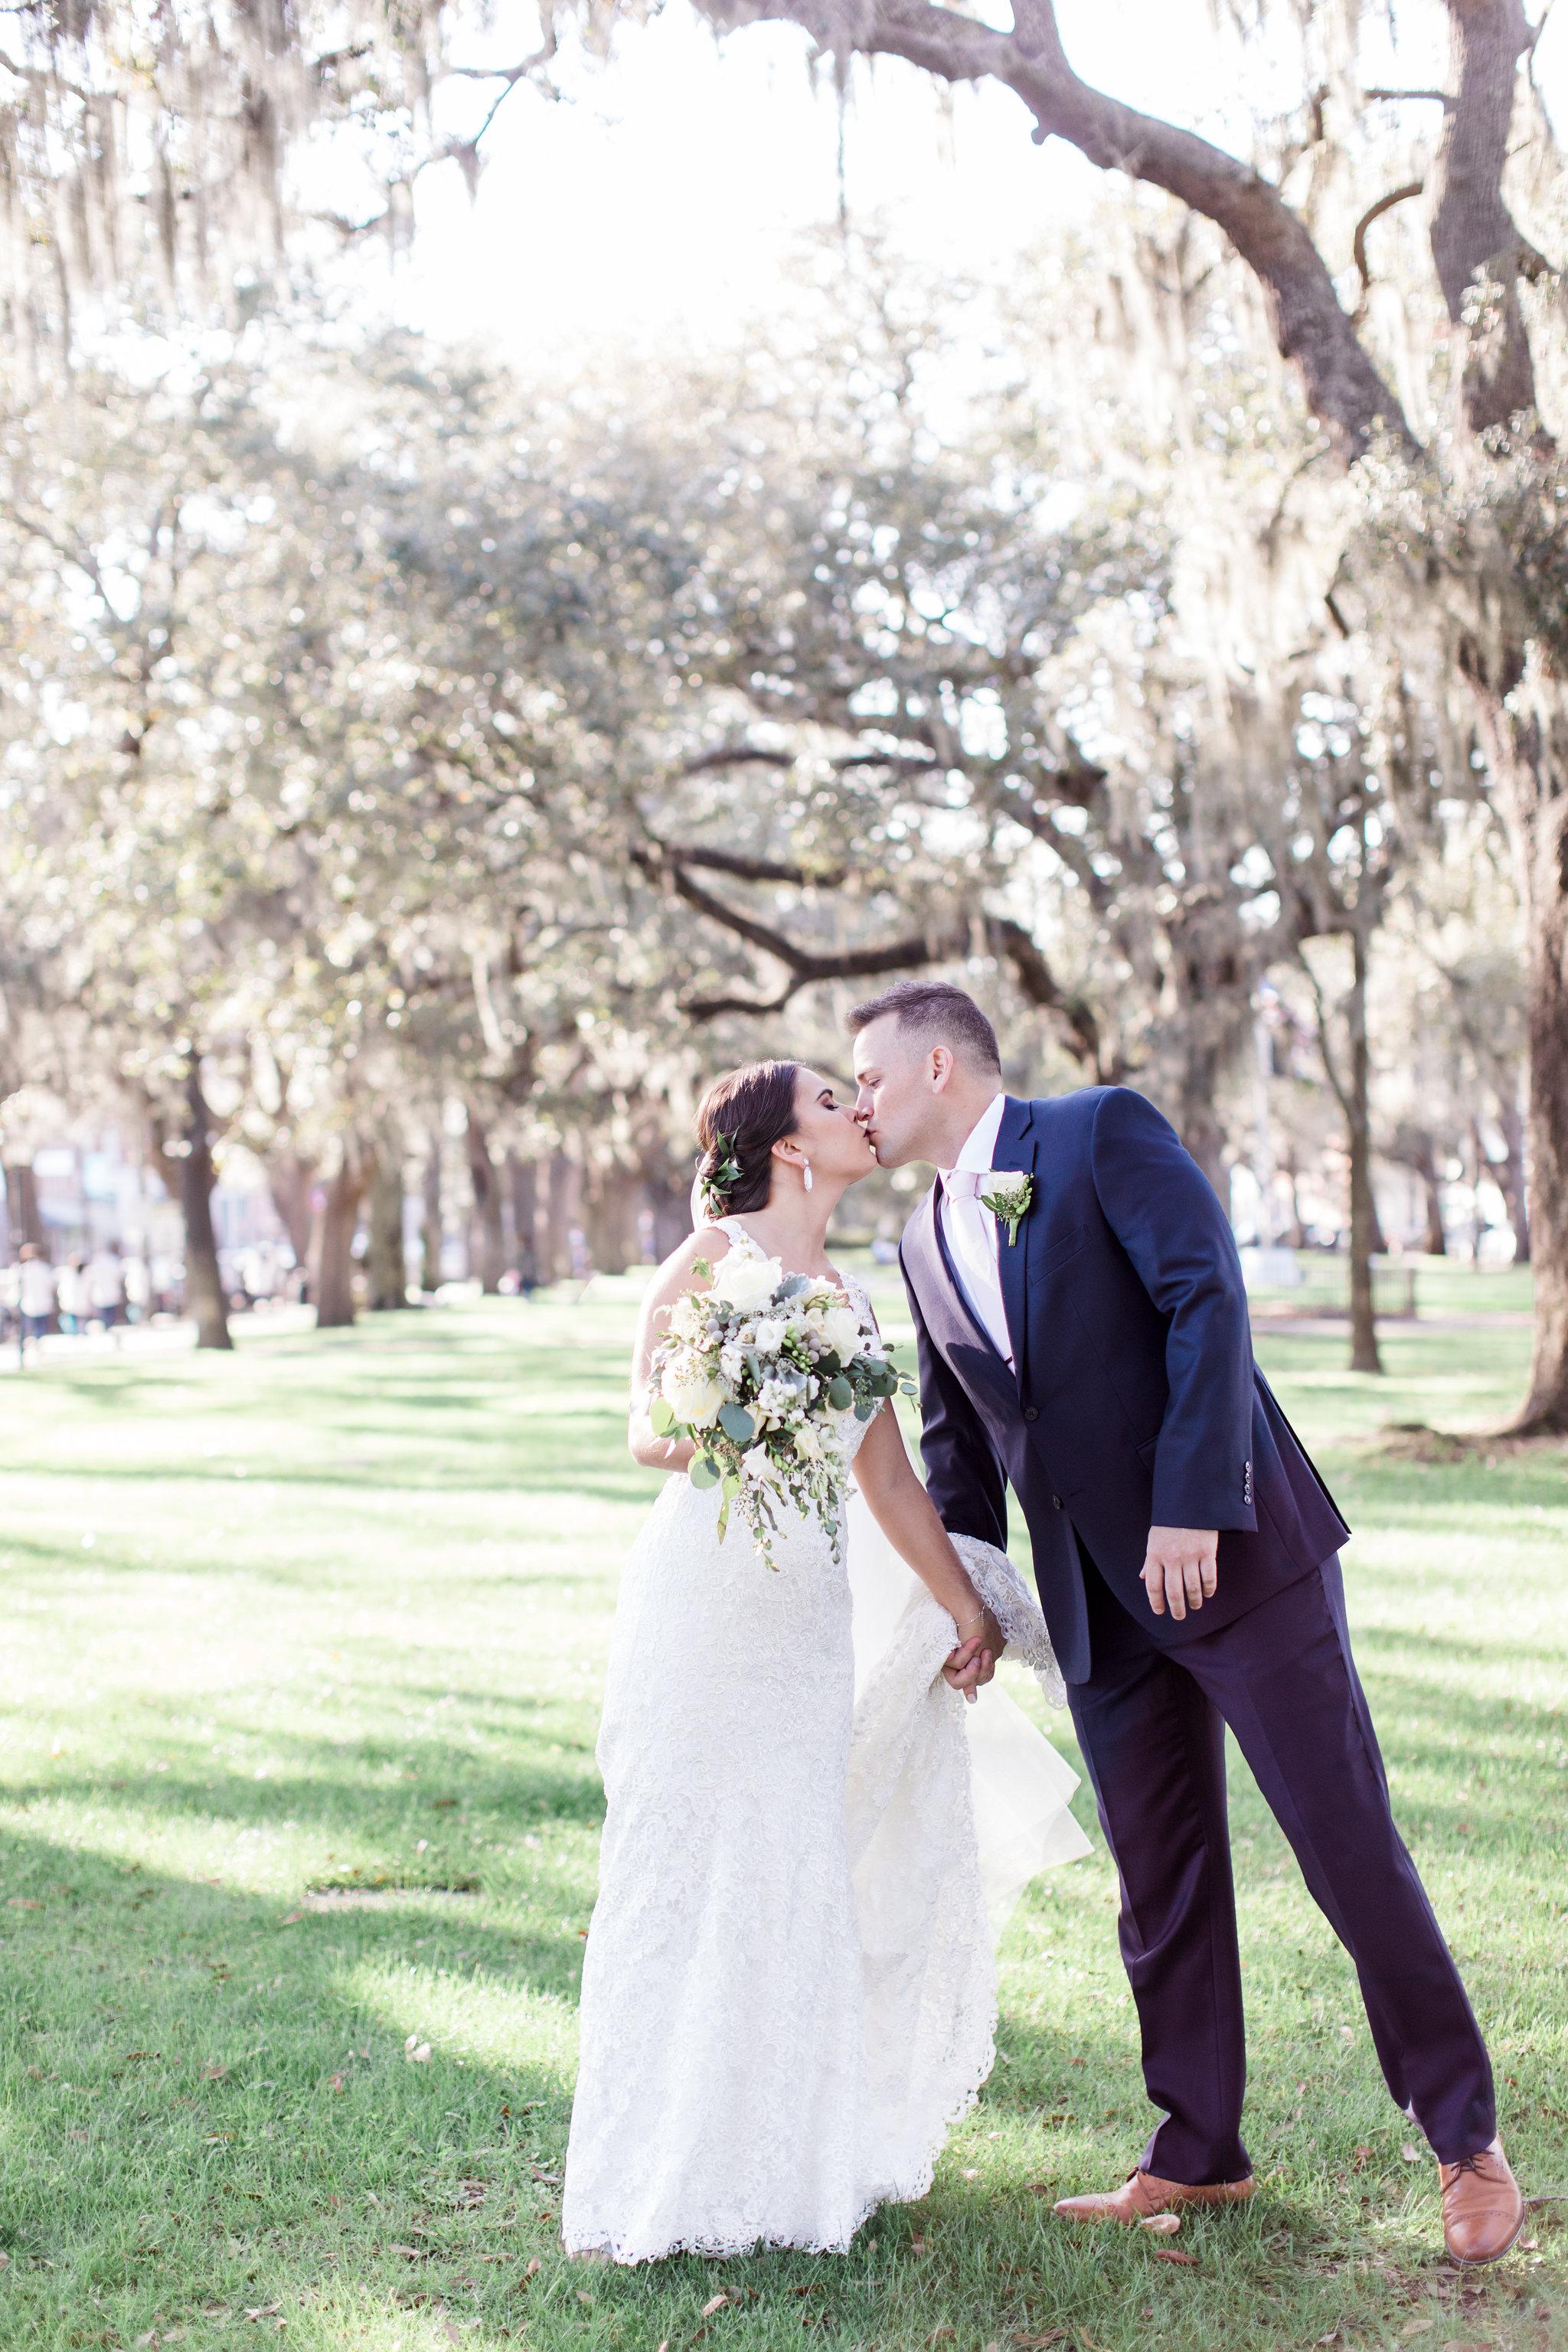 apt-b-photography-Savannah-wedding-photographer-savannah-engagement-photographer-historic-savannah-engagement-charles-h-morris-center-wedding-savannah-weddings-25.JPG